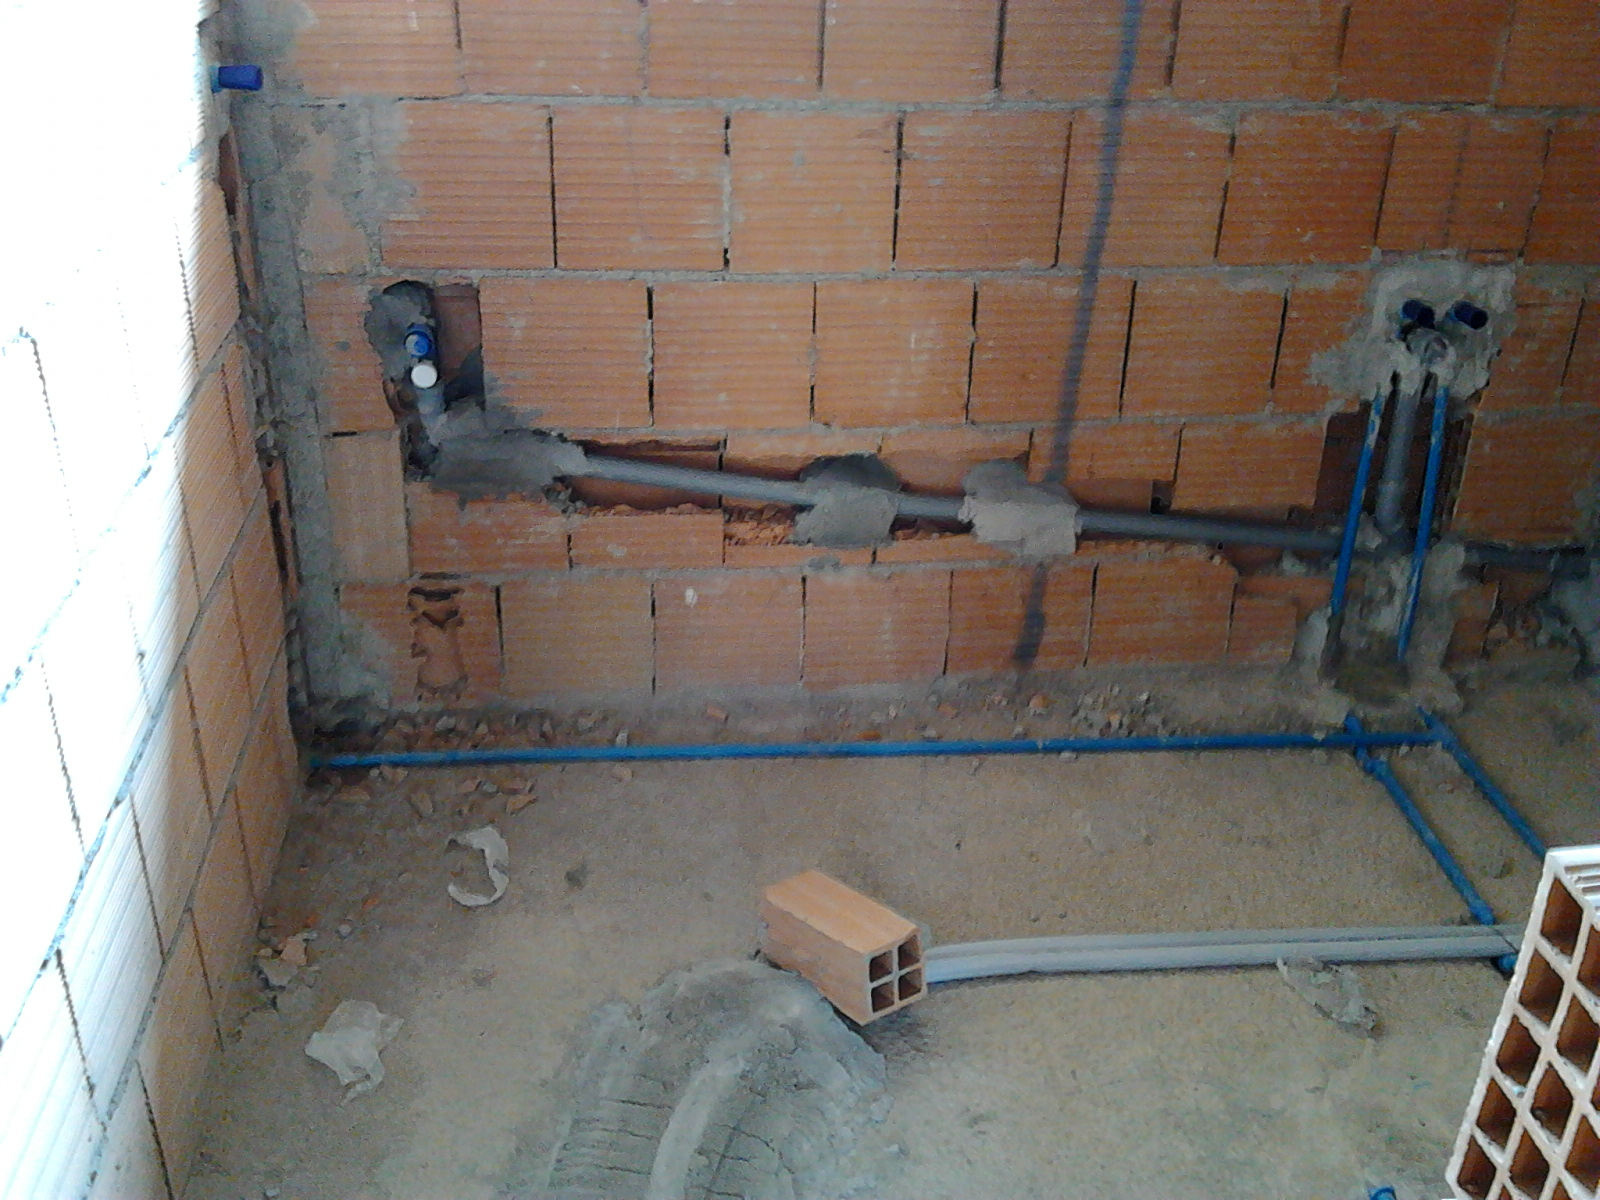 Come Fare Impianto Idraulico Bagno - Modelos De Casas - Justrigs.com